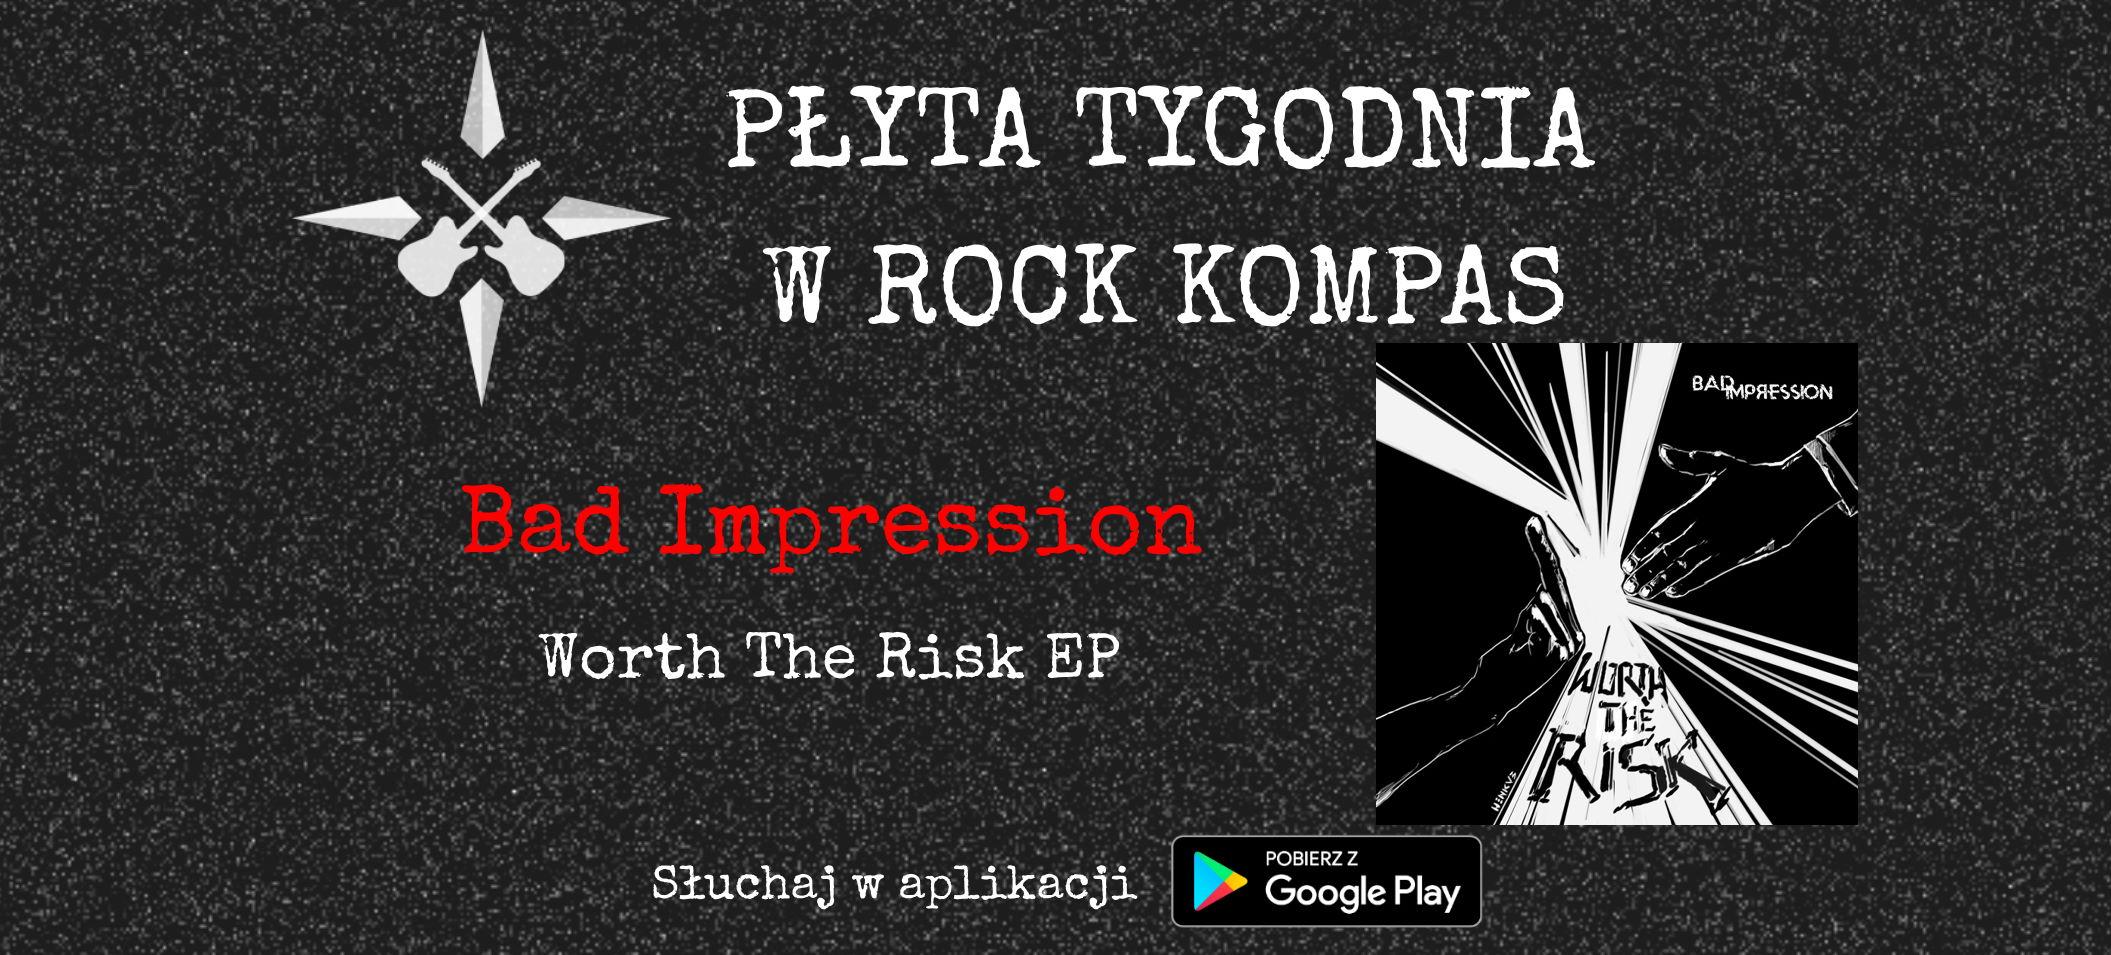 Płyta tygodnia w Rock Kompas: Bad Impression - Worth The Risk EP